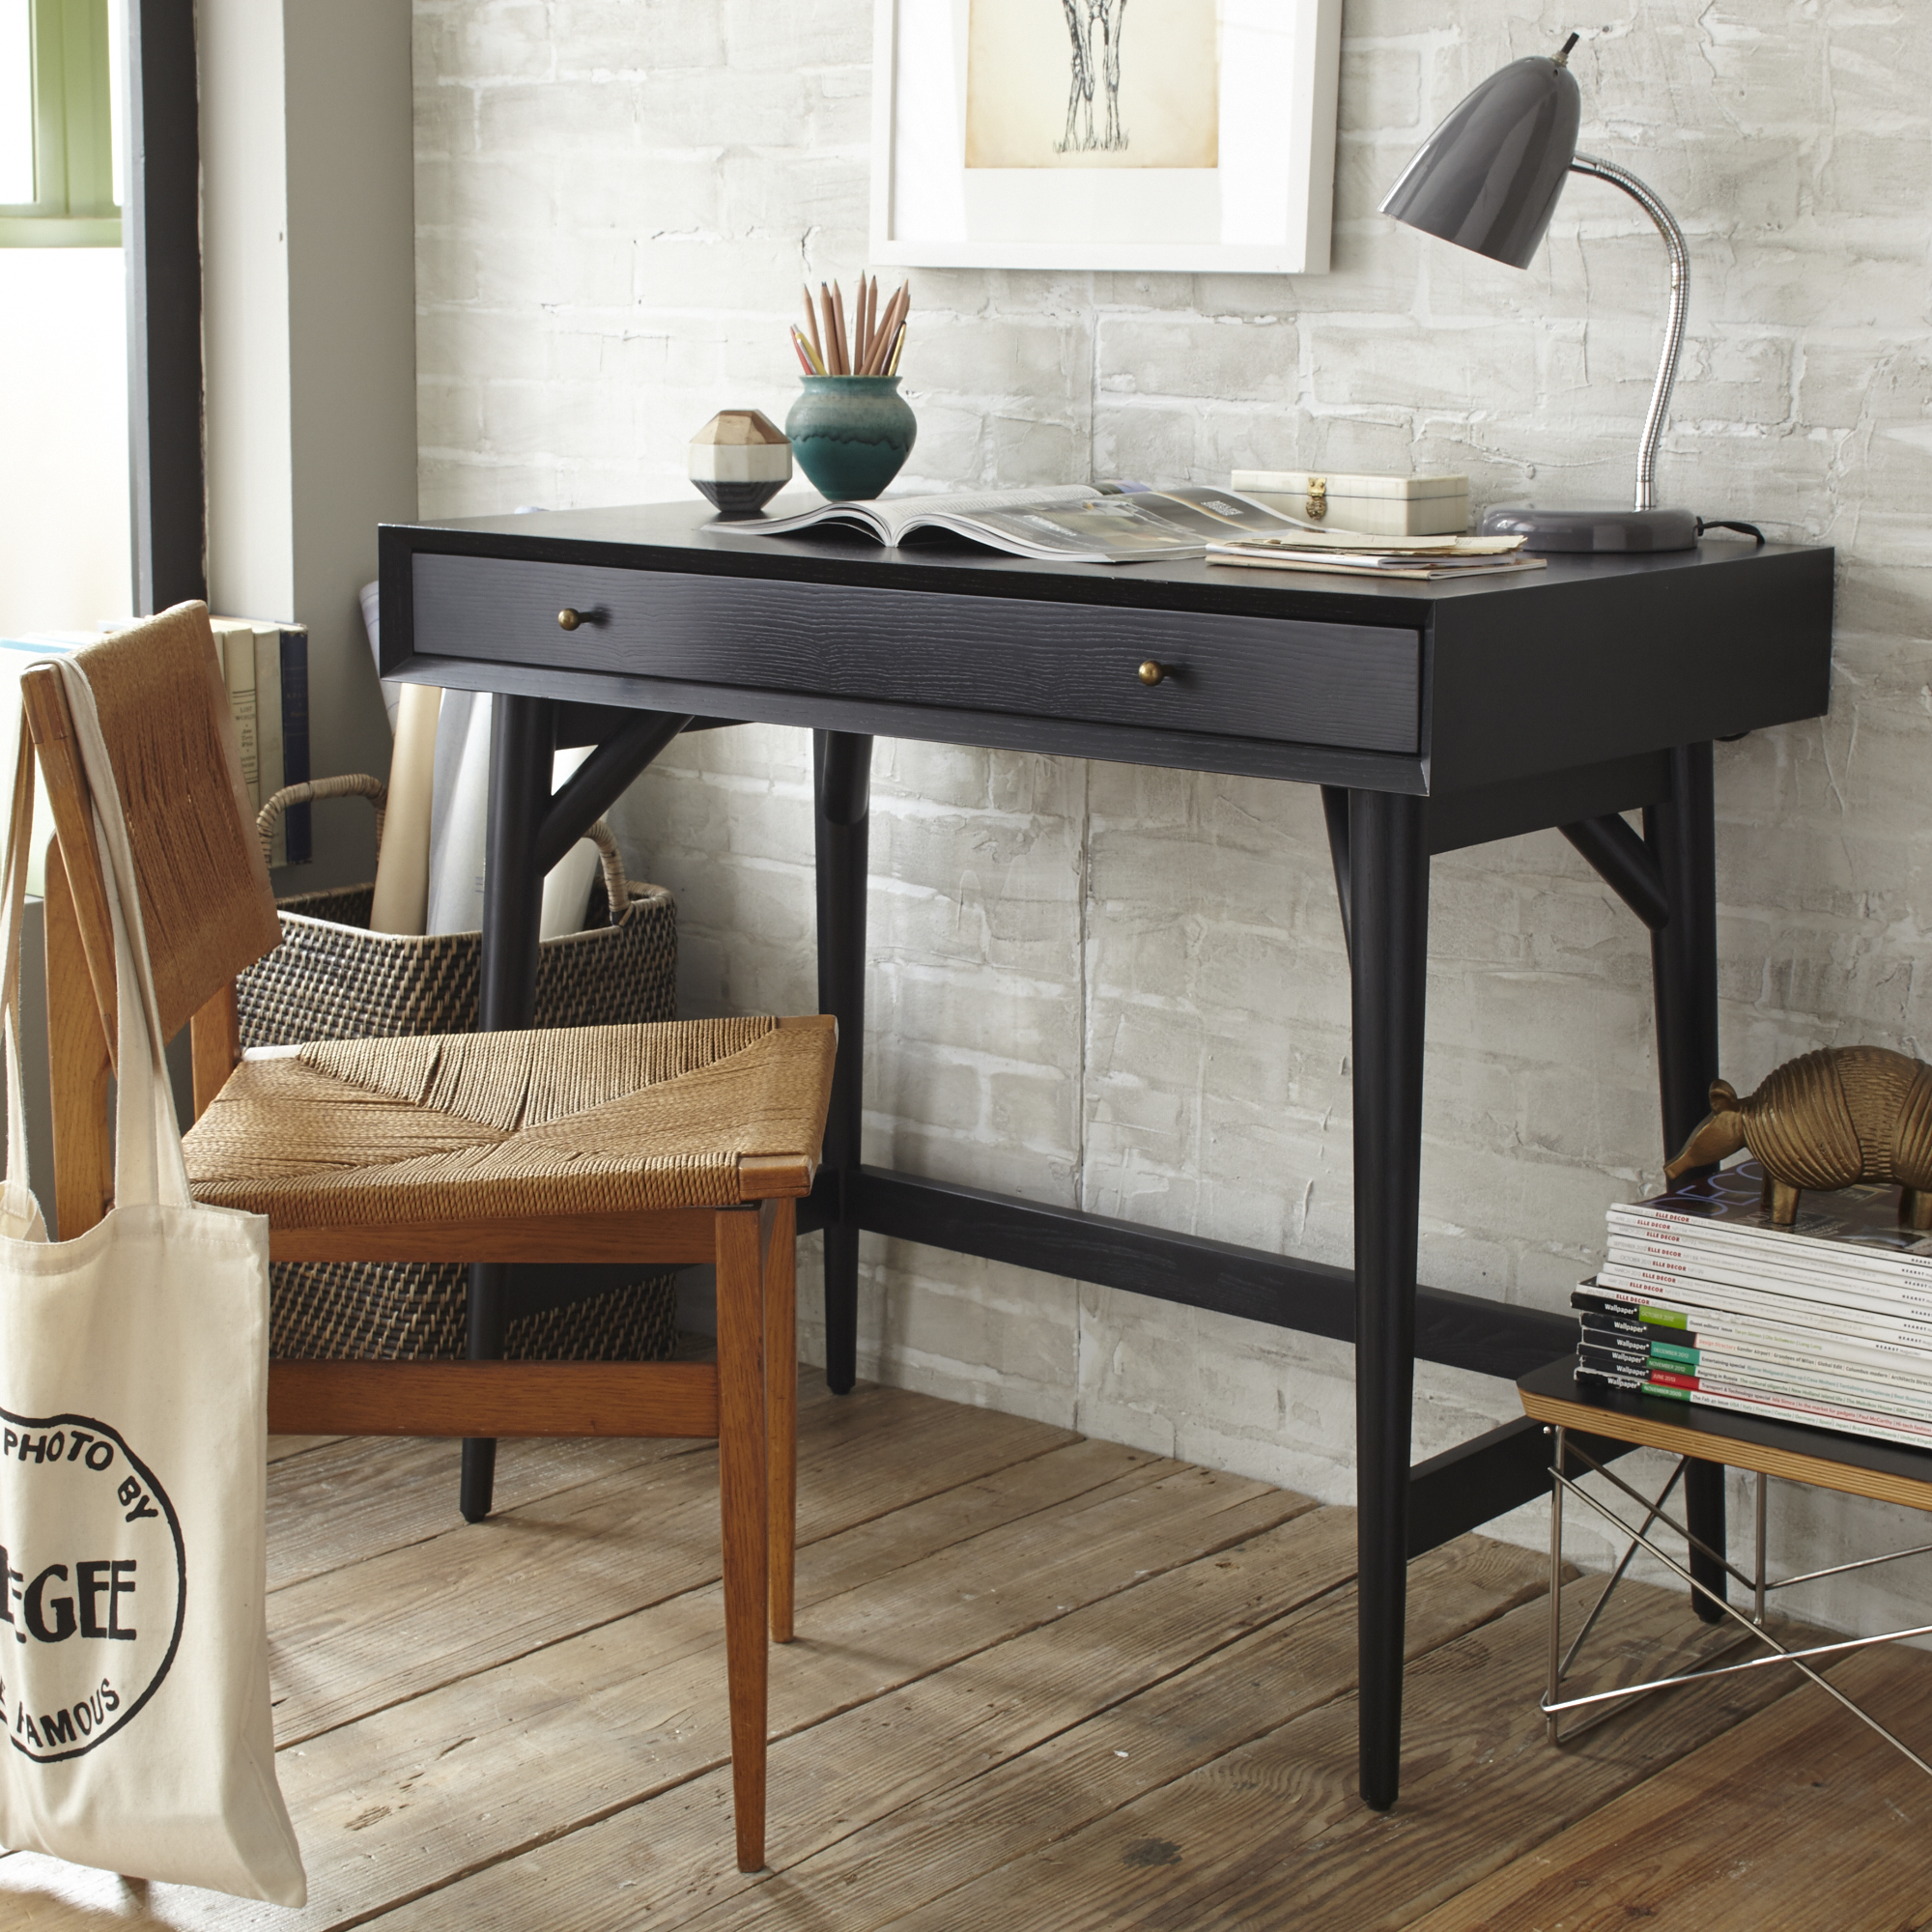 pip-mid-century-mini-desk-black-fa14-052.jpg